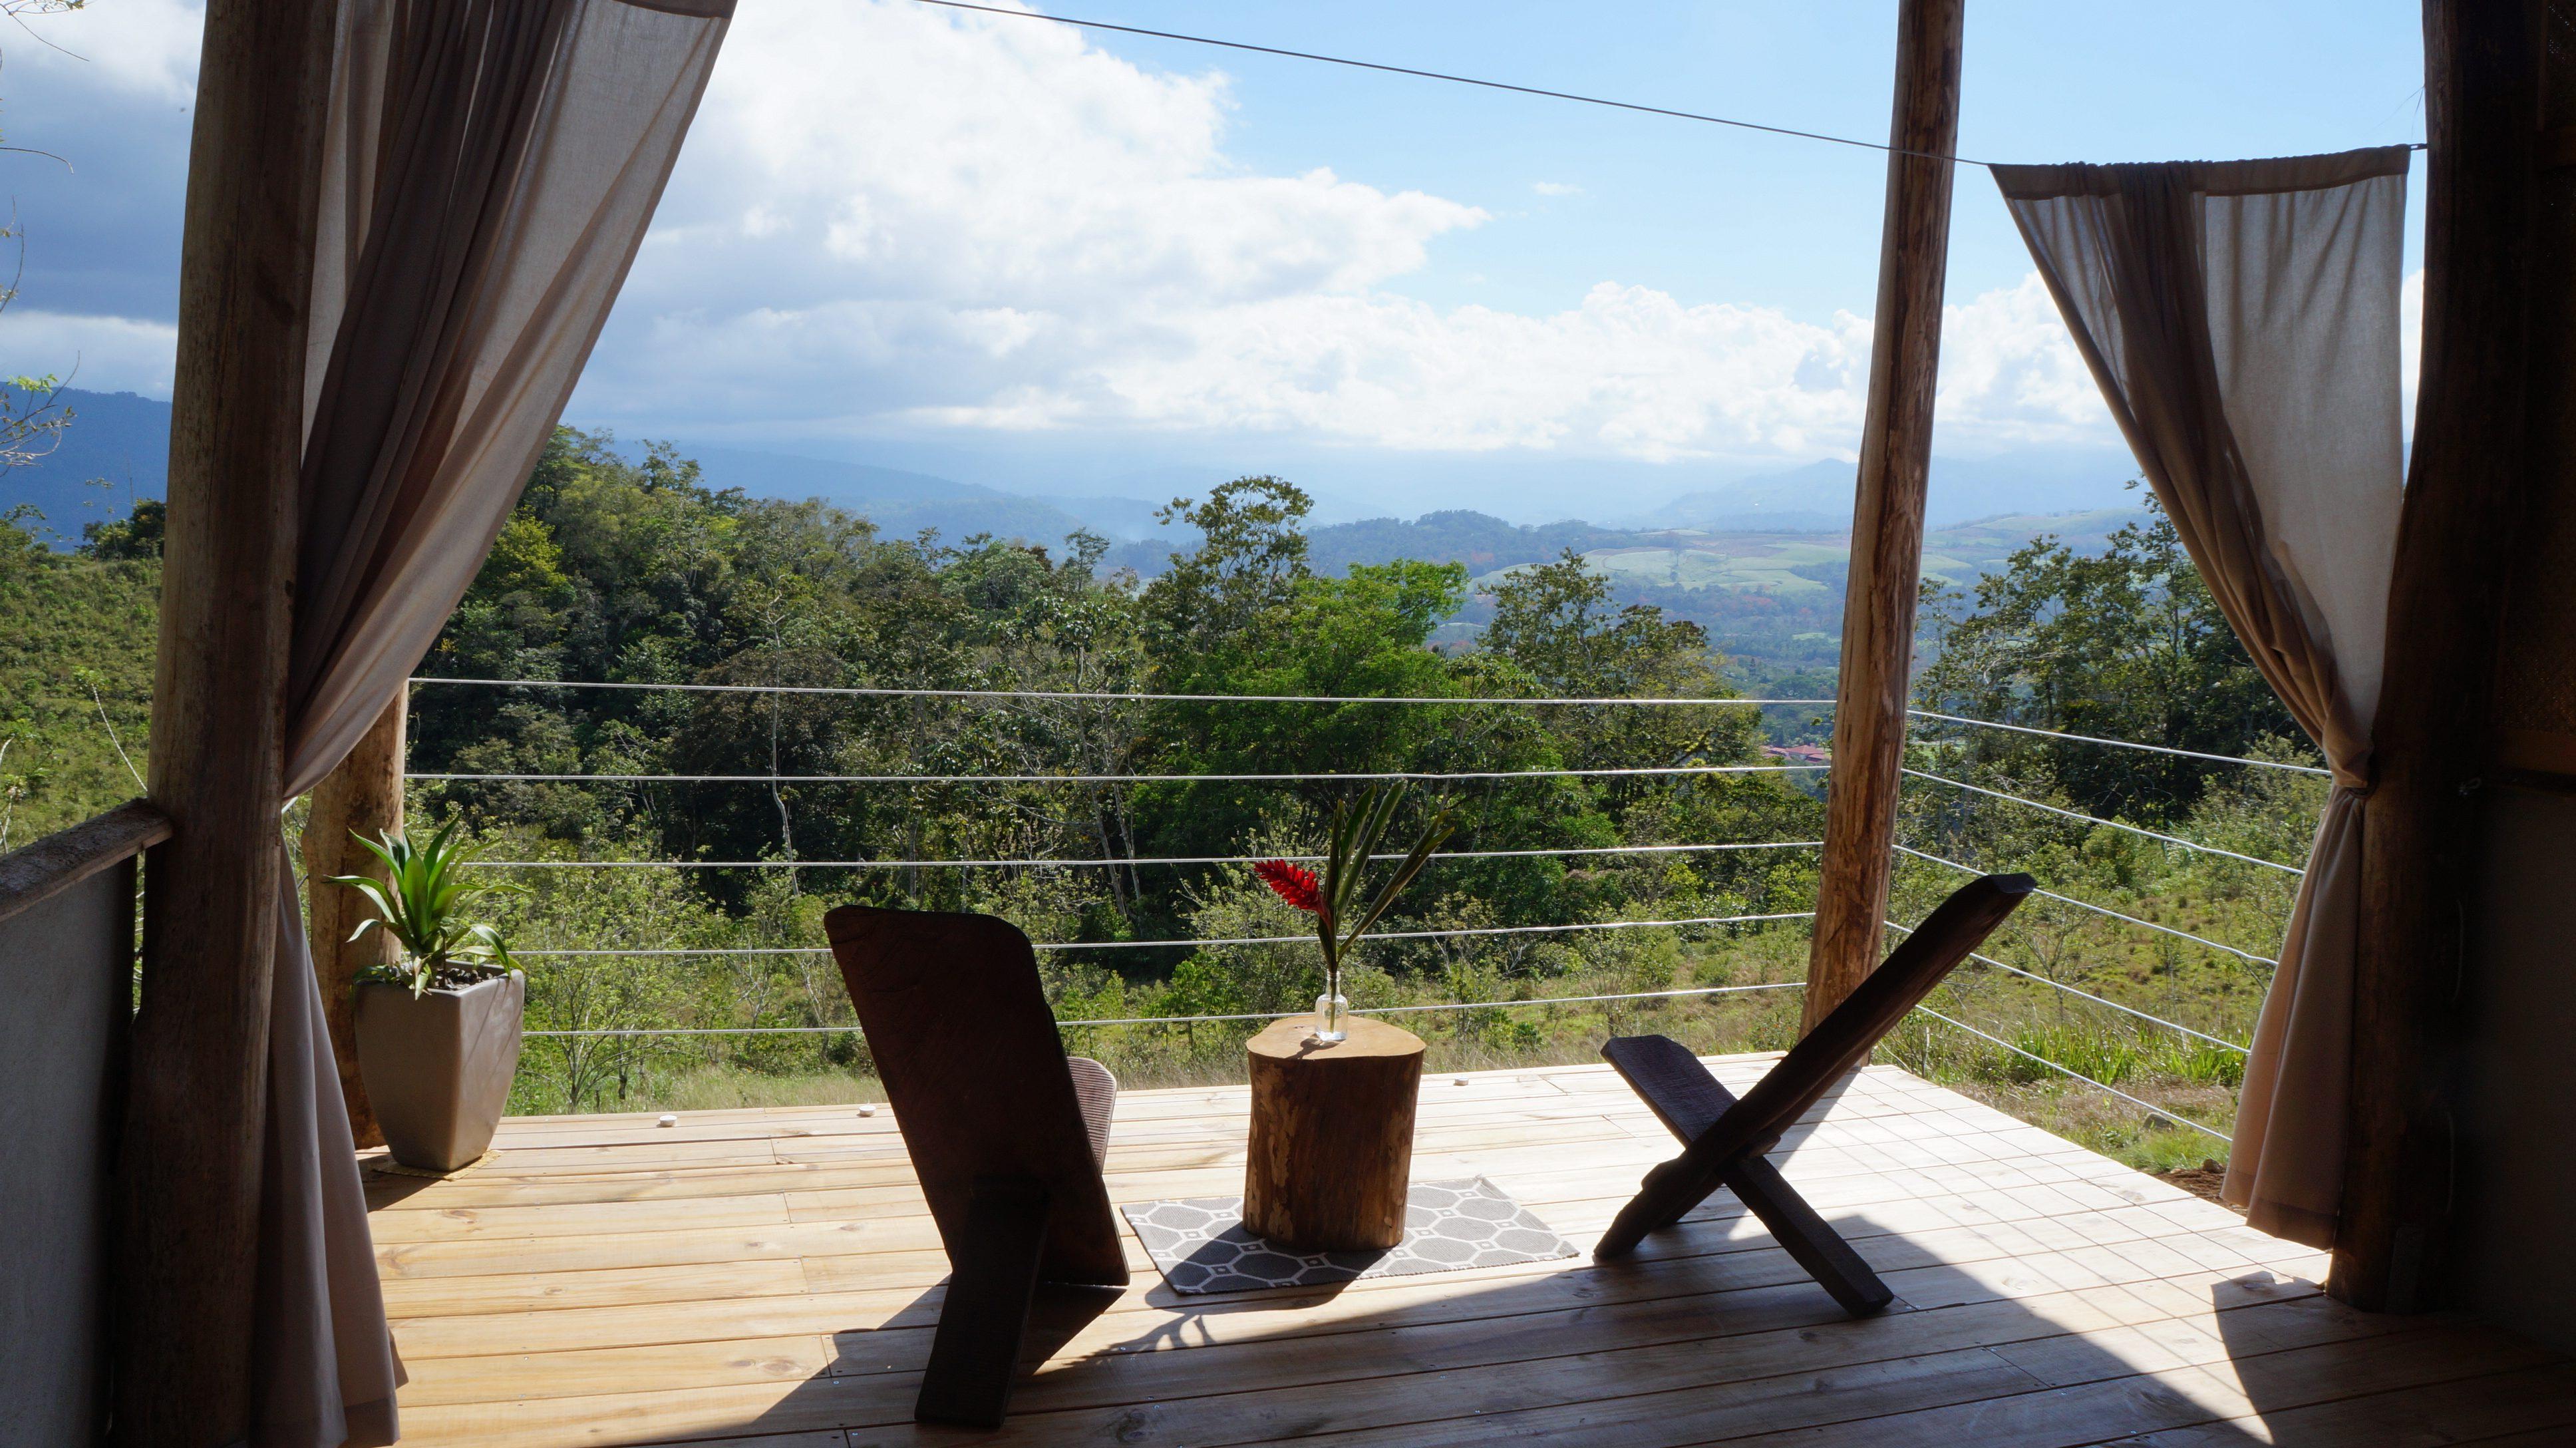 Eco-Deck Hacienda Monte Claro - 2 pers. - Costa Rica